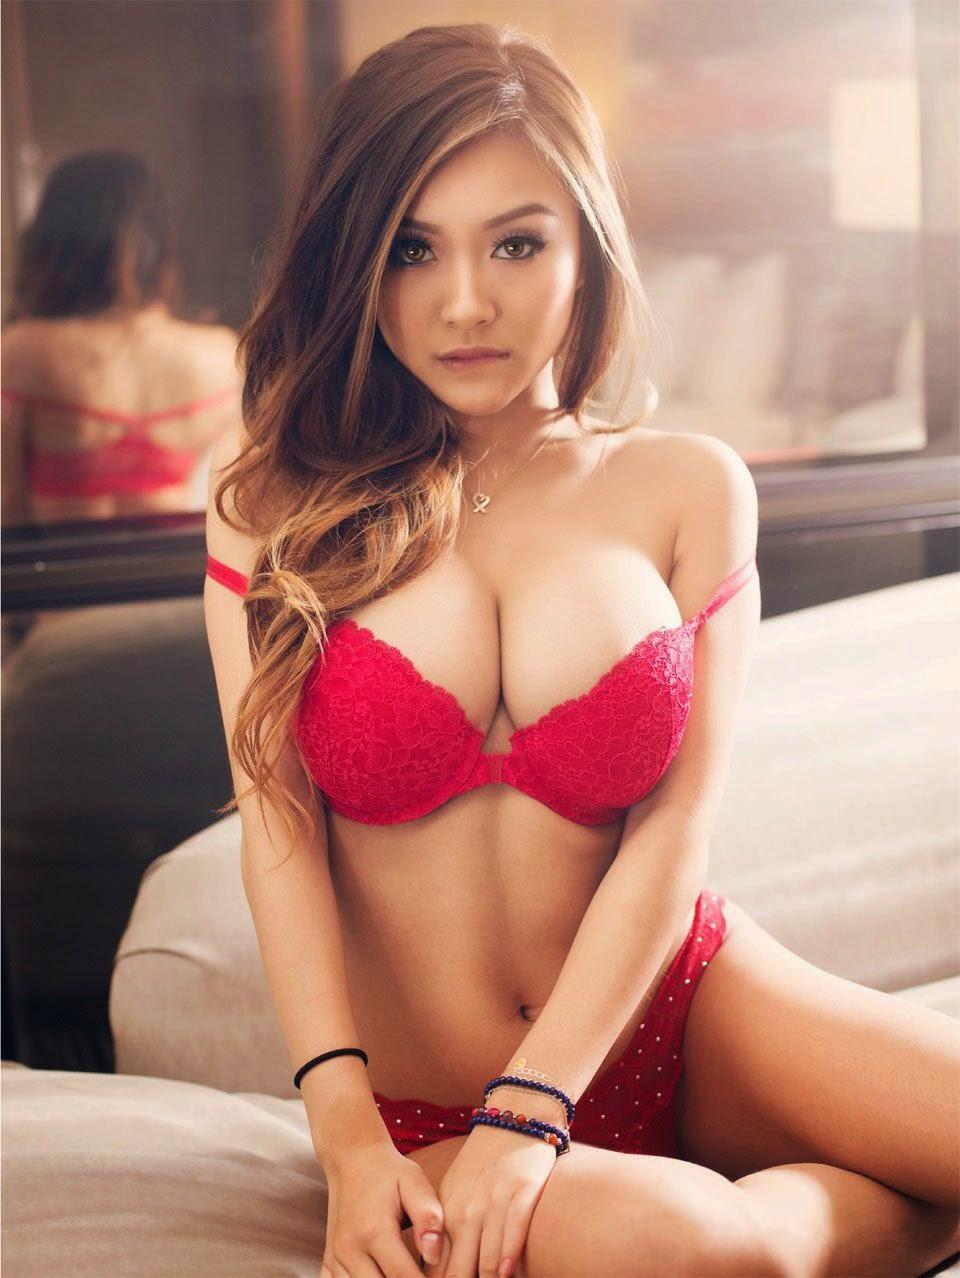 sexy asian girls bra and panty pics 01